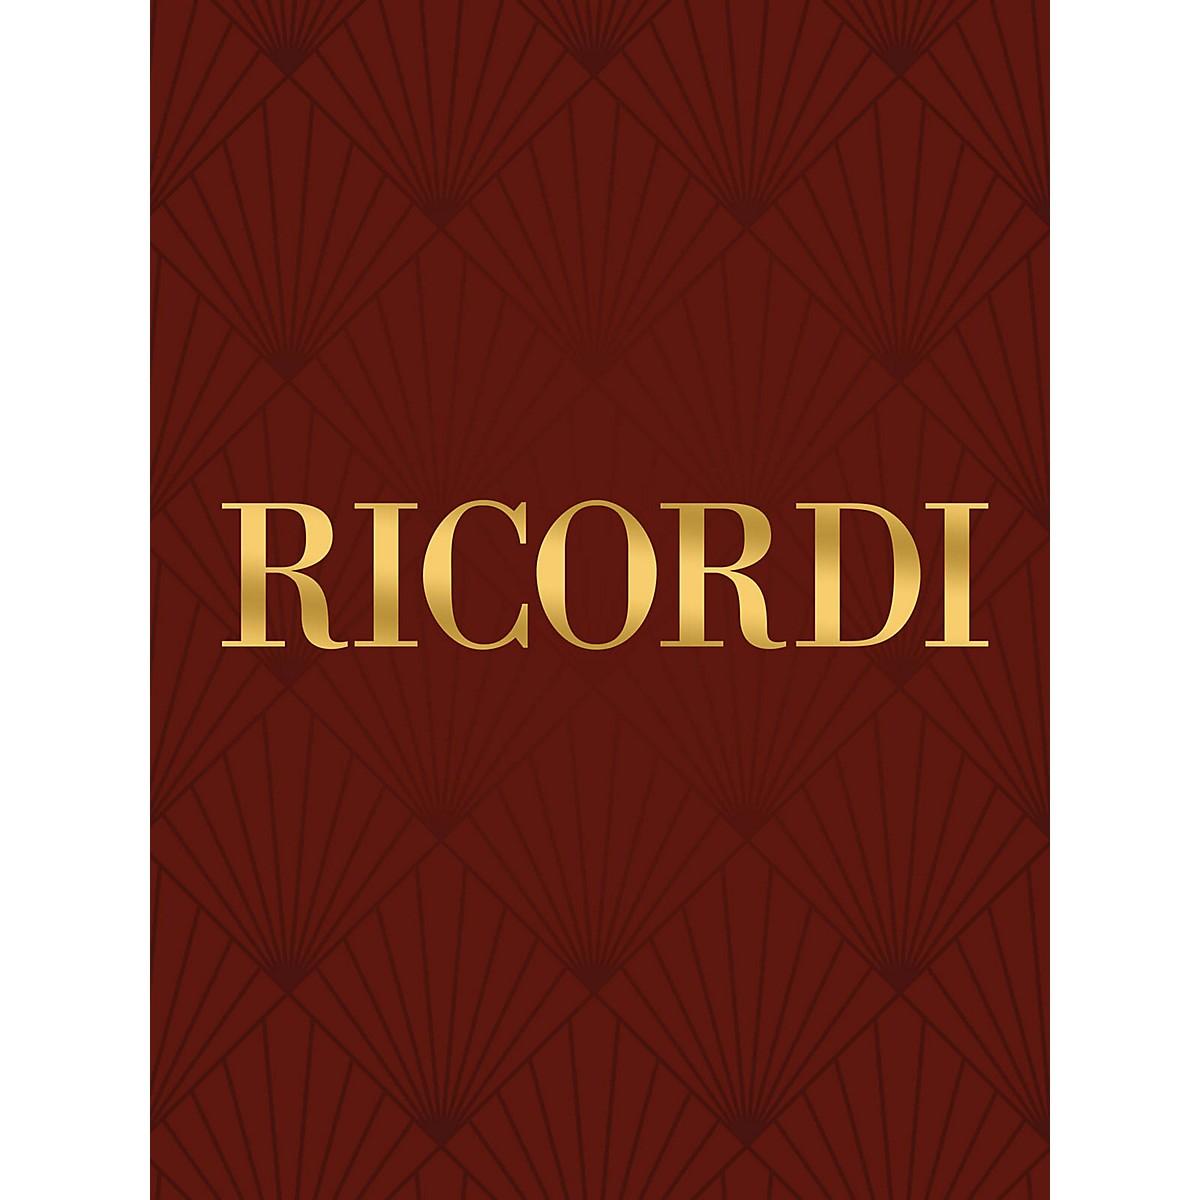 Ricordi Sonata in D Major for Violin and Basso Continuo RV10 String Solo Composed by Vivaldi Edited by Respighi